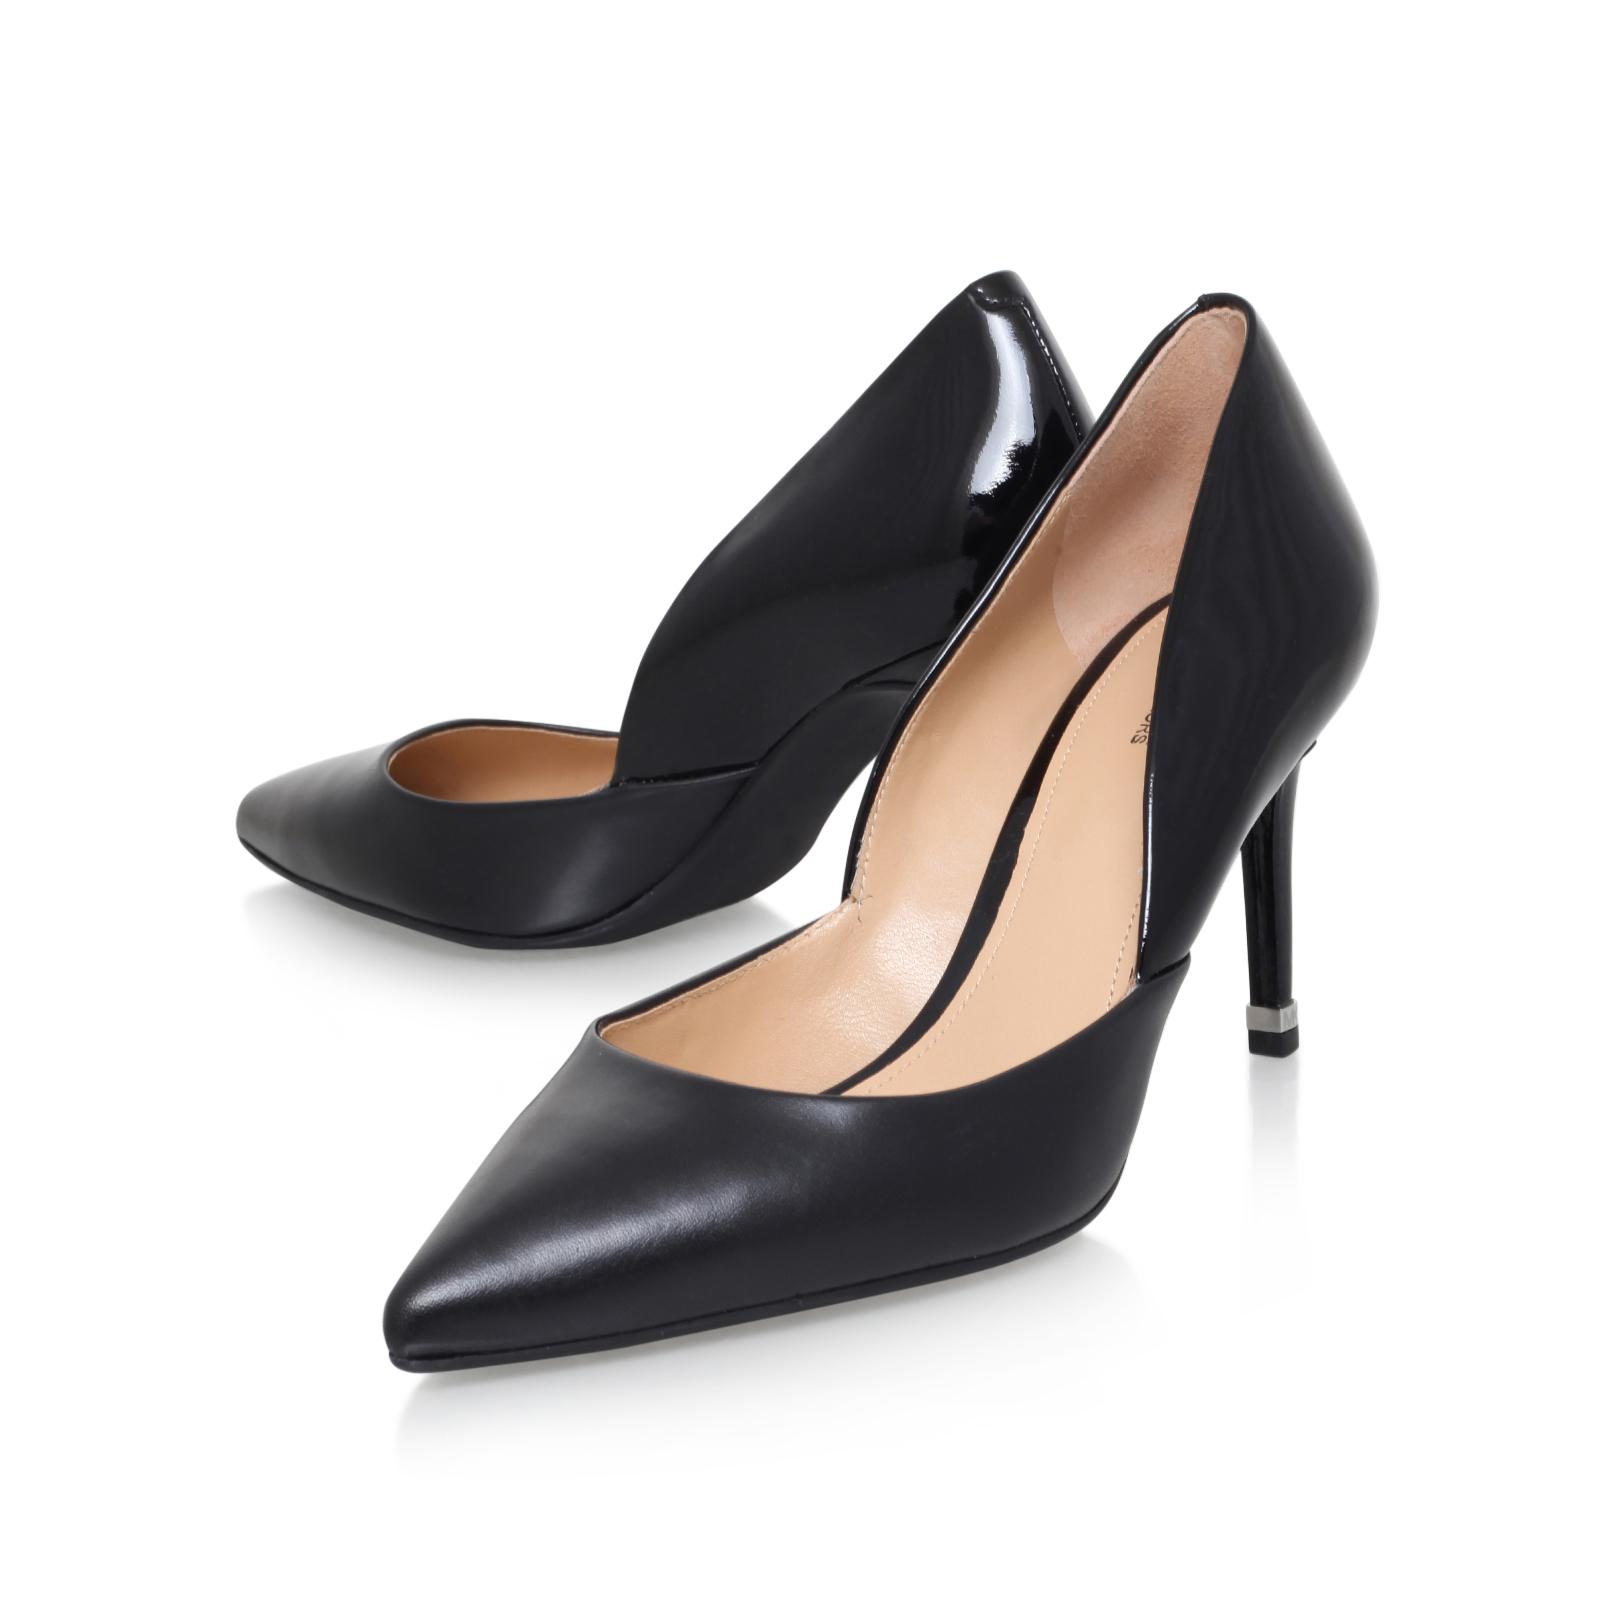 ASHBY FLEX MID PUMP Michael Michael Kors Ashby Black High Heel Court Shoes  by MICHAEL MICHAEL KORS